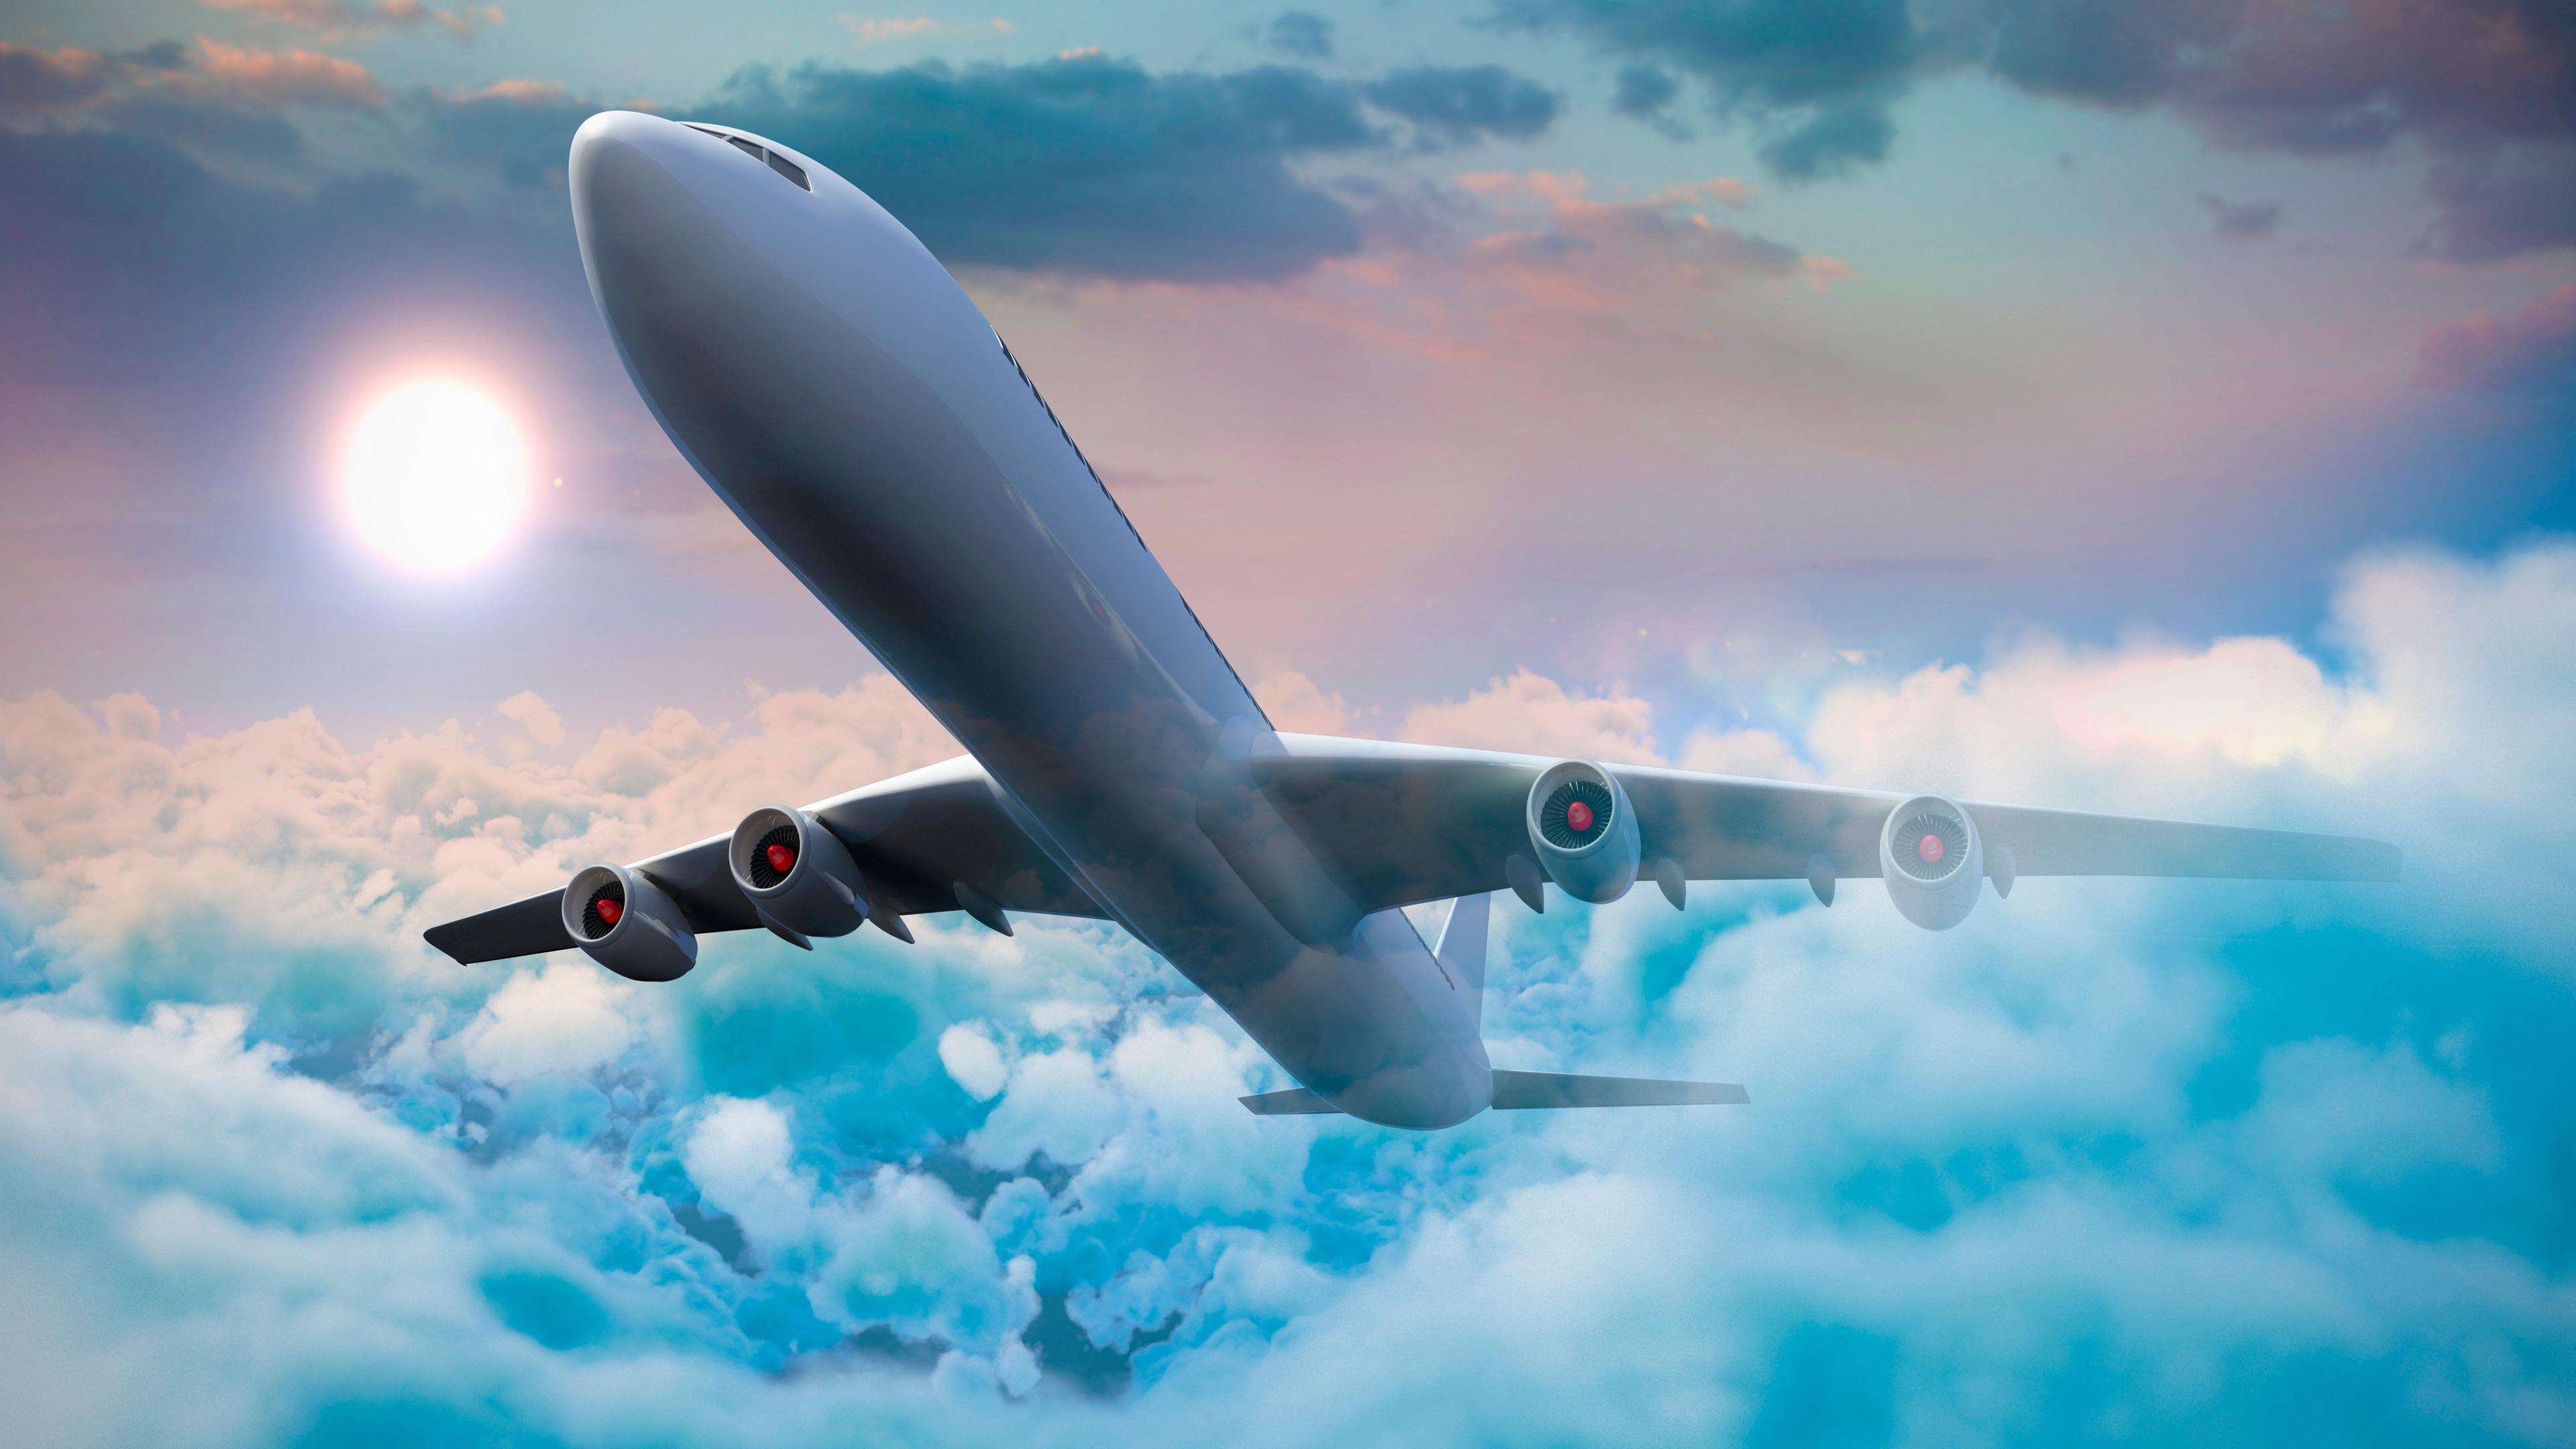 passenger airplanes clouds 4k 1547938030 - Passenger Airplanes Clouds 4k - planes wallpapers, flight wallpapers, clouds wallpapers, airplanes wallpapers, airplane wallpapers, 5k wallpapers, 4k-wallpapers